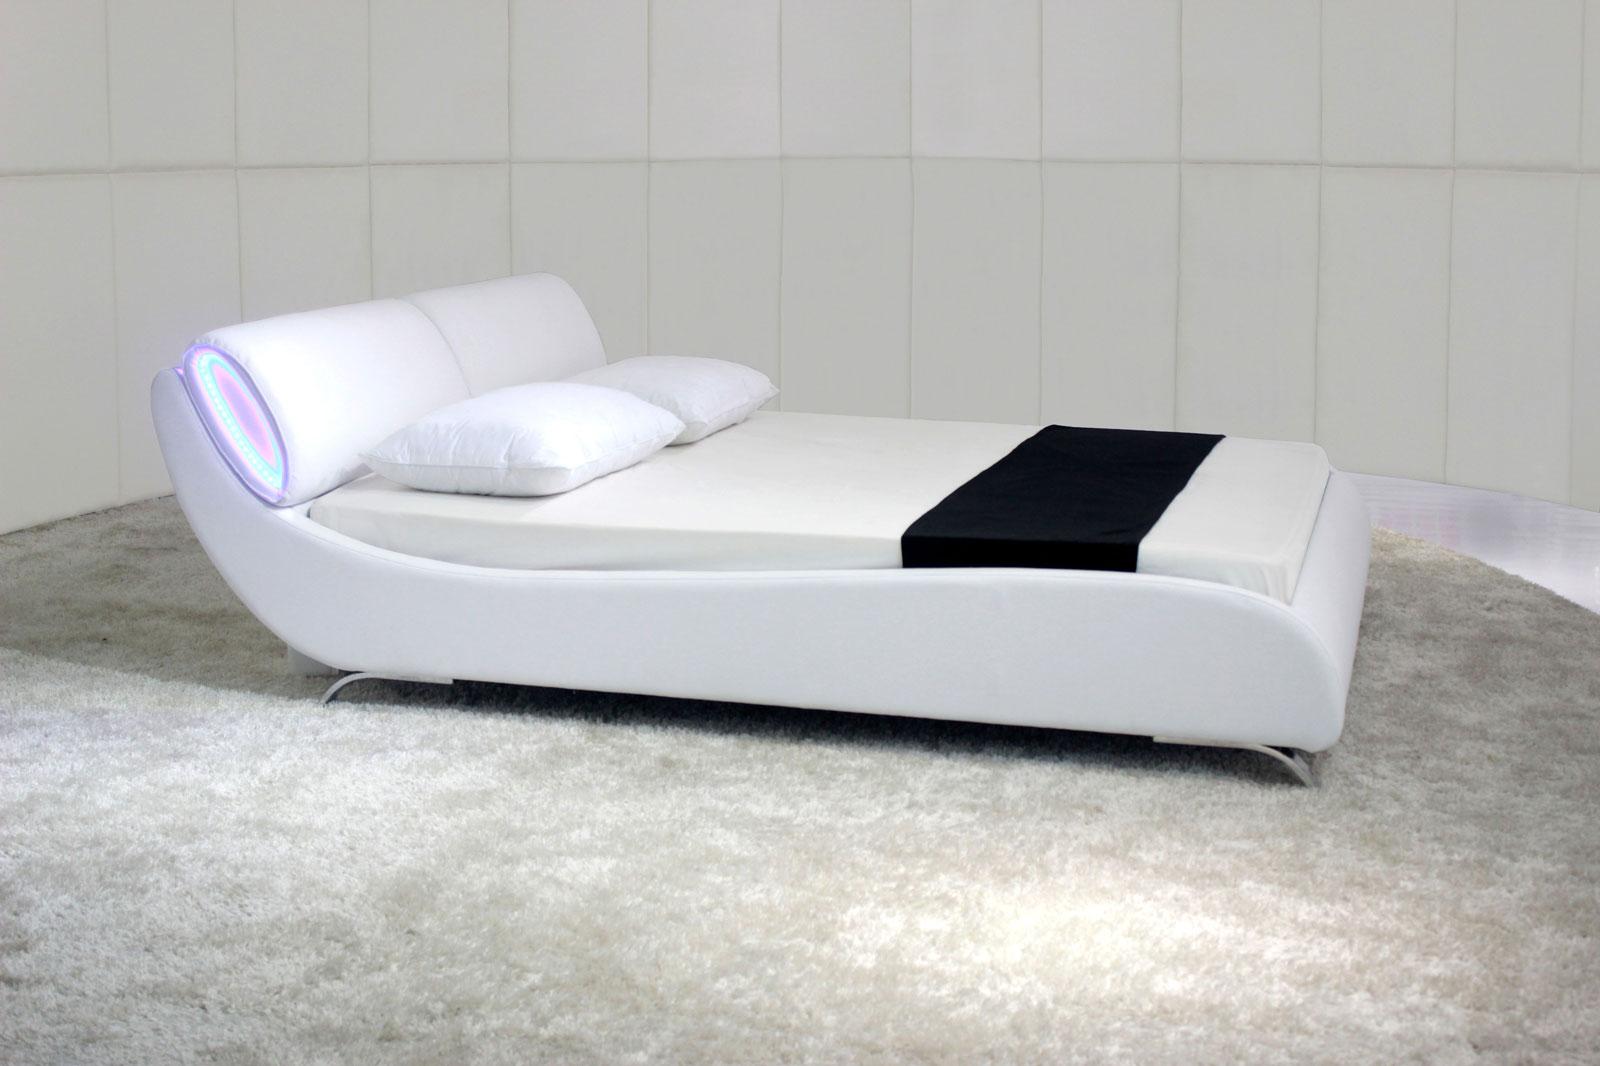 sam polsterbett 180 x 200 cm wei mit led lacrose. Black Bedroom Furniture Sets. Home Design Ideas